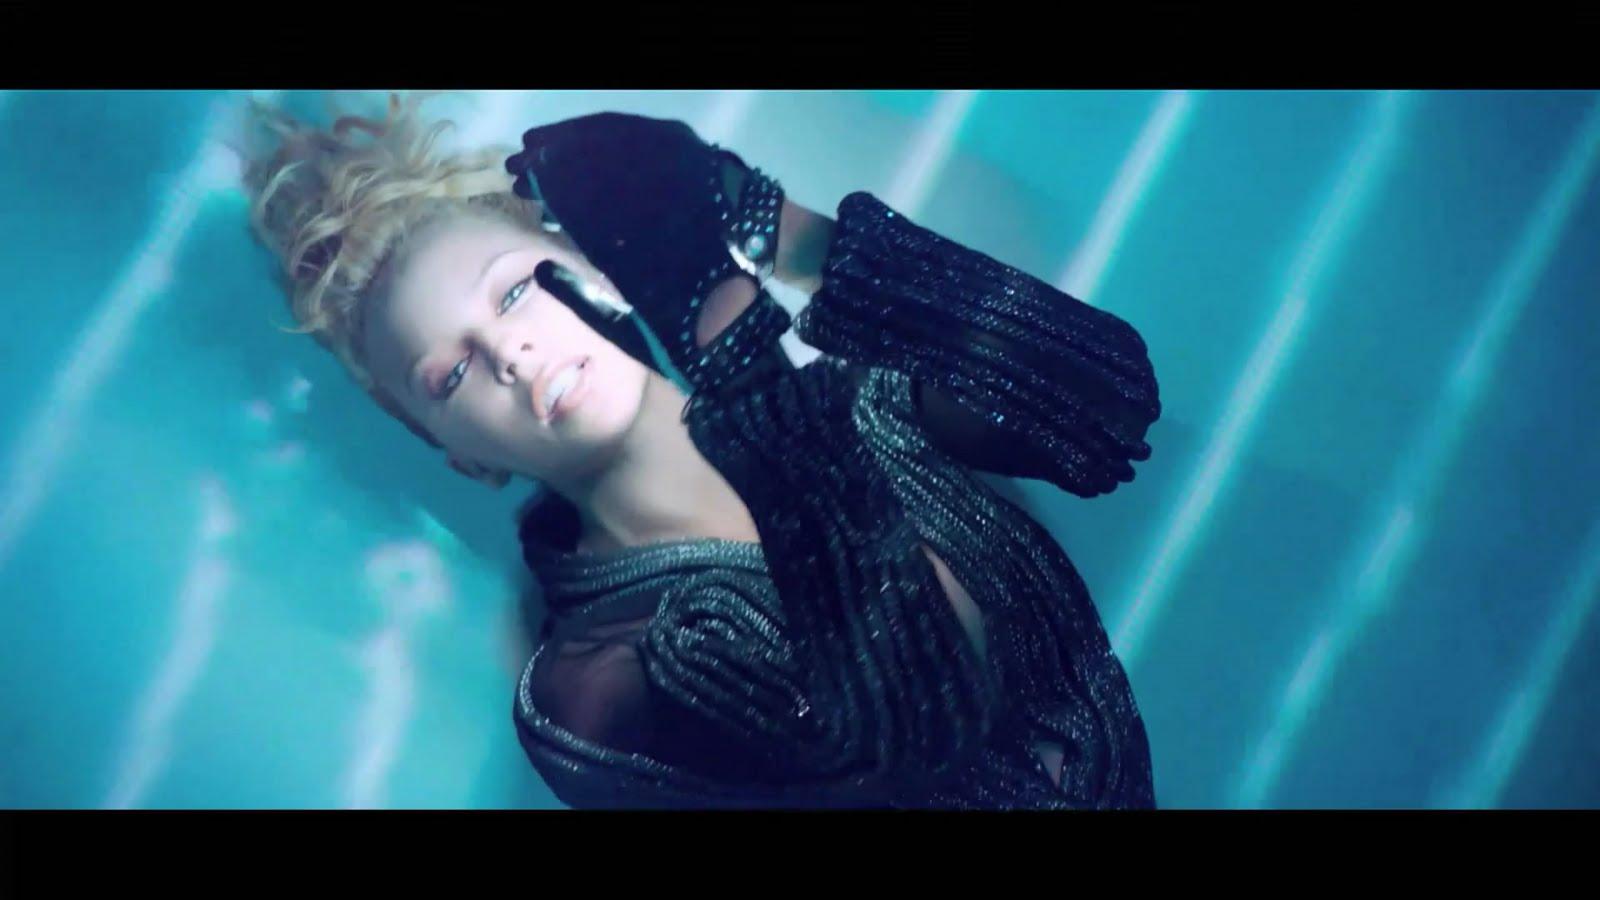 http://4.bp.blogspot.com/_mtOlIyneP-A/TMYZiYIy8nI/AAAAAAAABDM/gNj80xTKpTw/s1600/Kylie+Minogue+-+Get+Outta+My+Way+%28HD%29.mkv_snapshot_00.43_%5B2010.10.25_20.44.53%5D.jpg